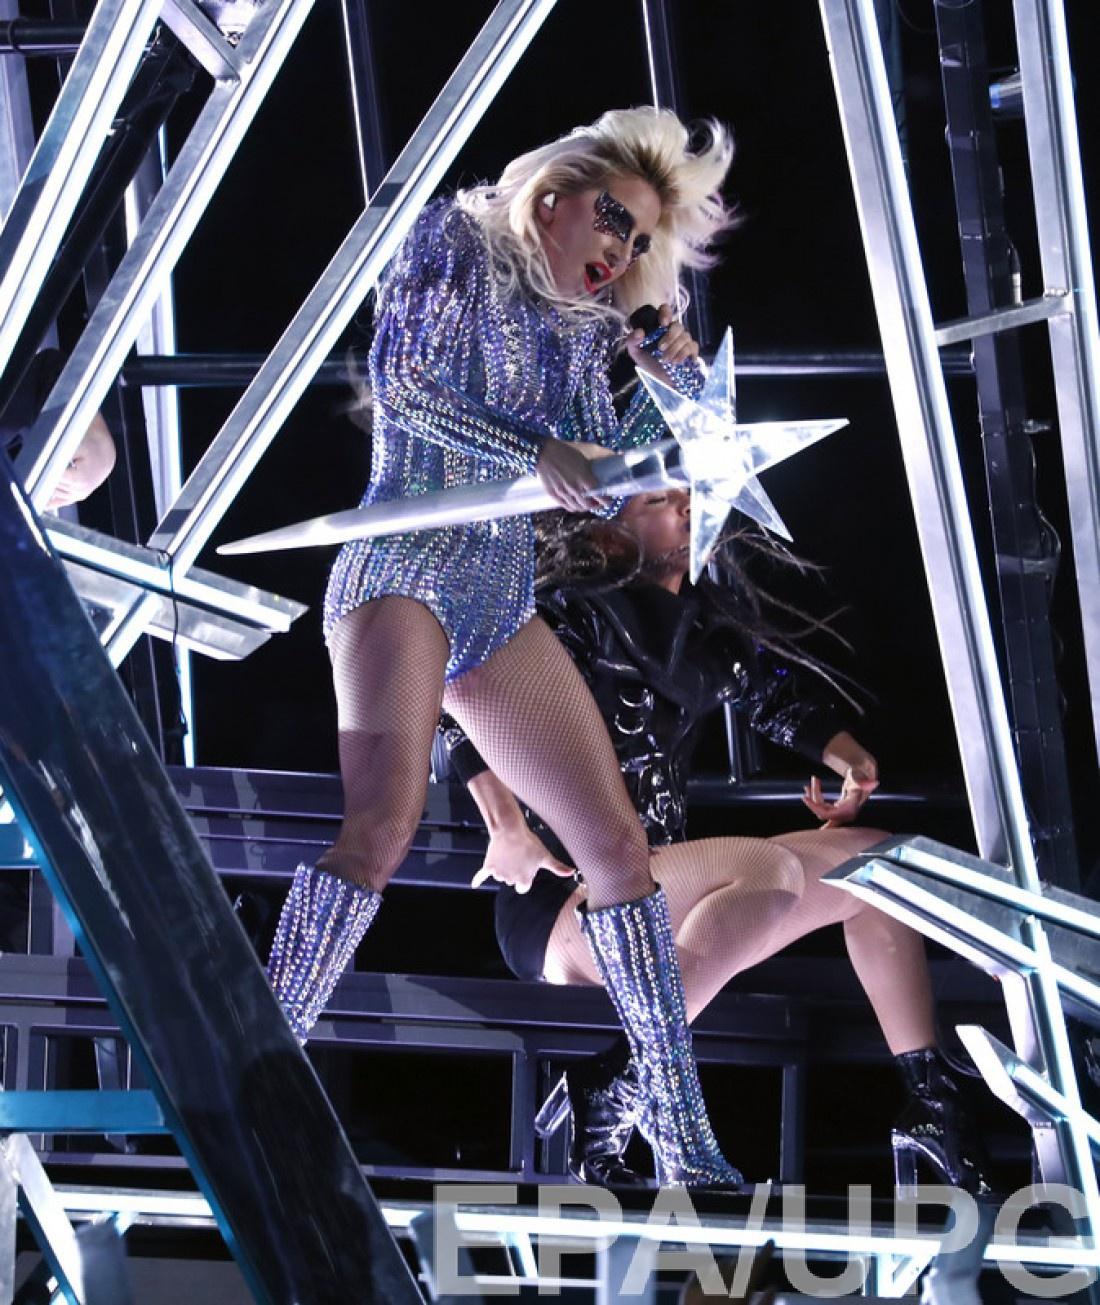 30-летняя певица  Lady Gaga